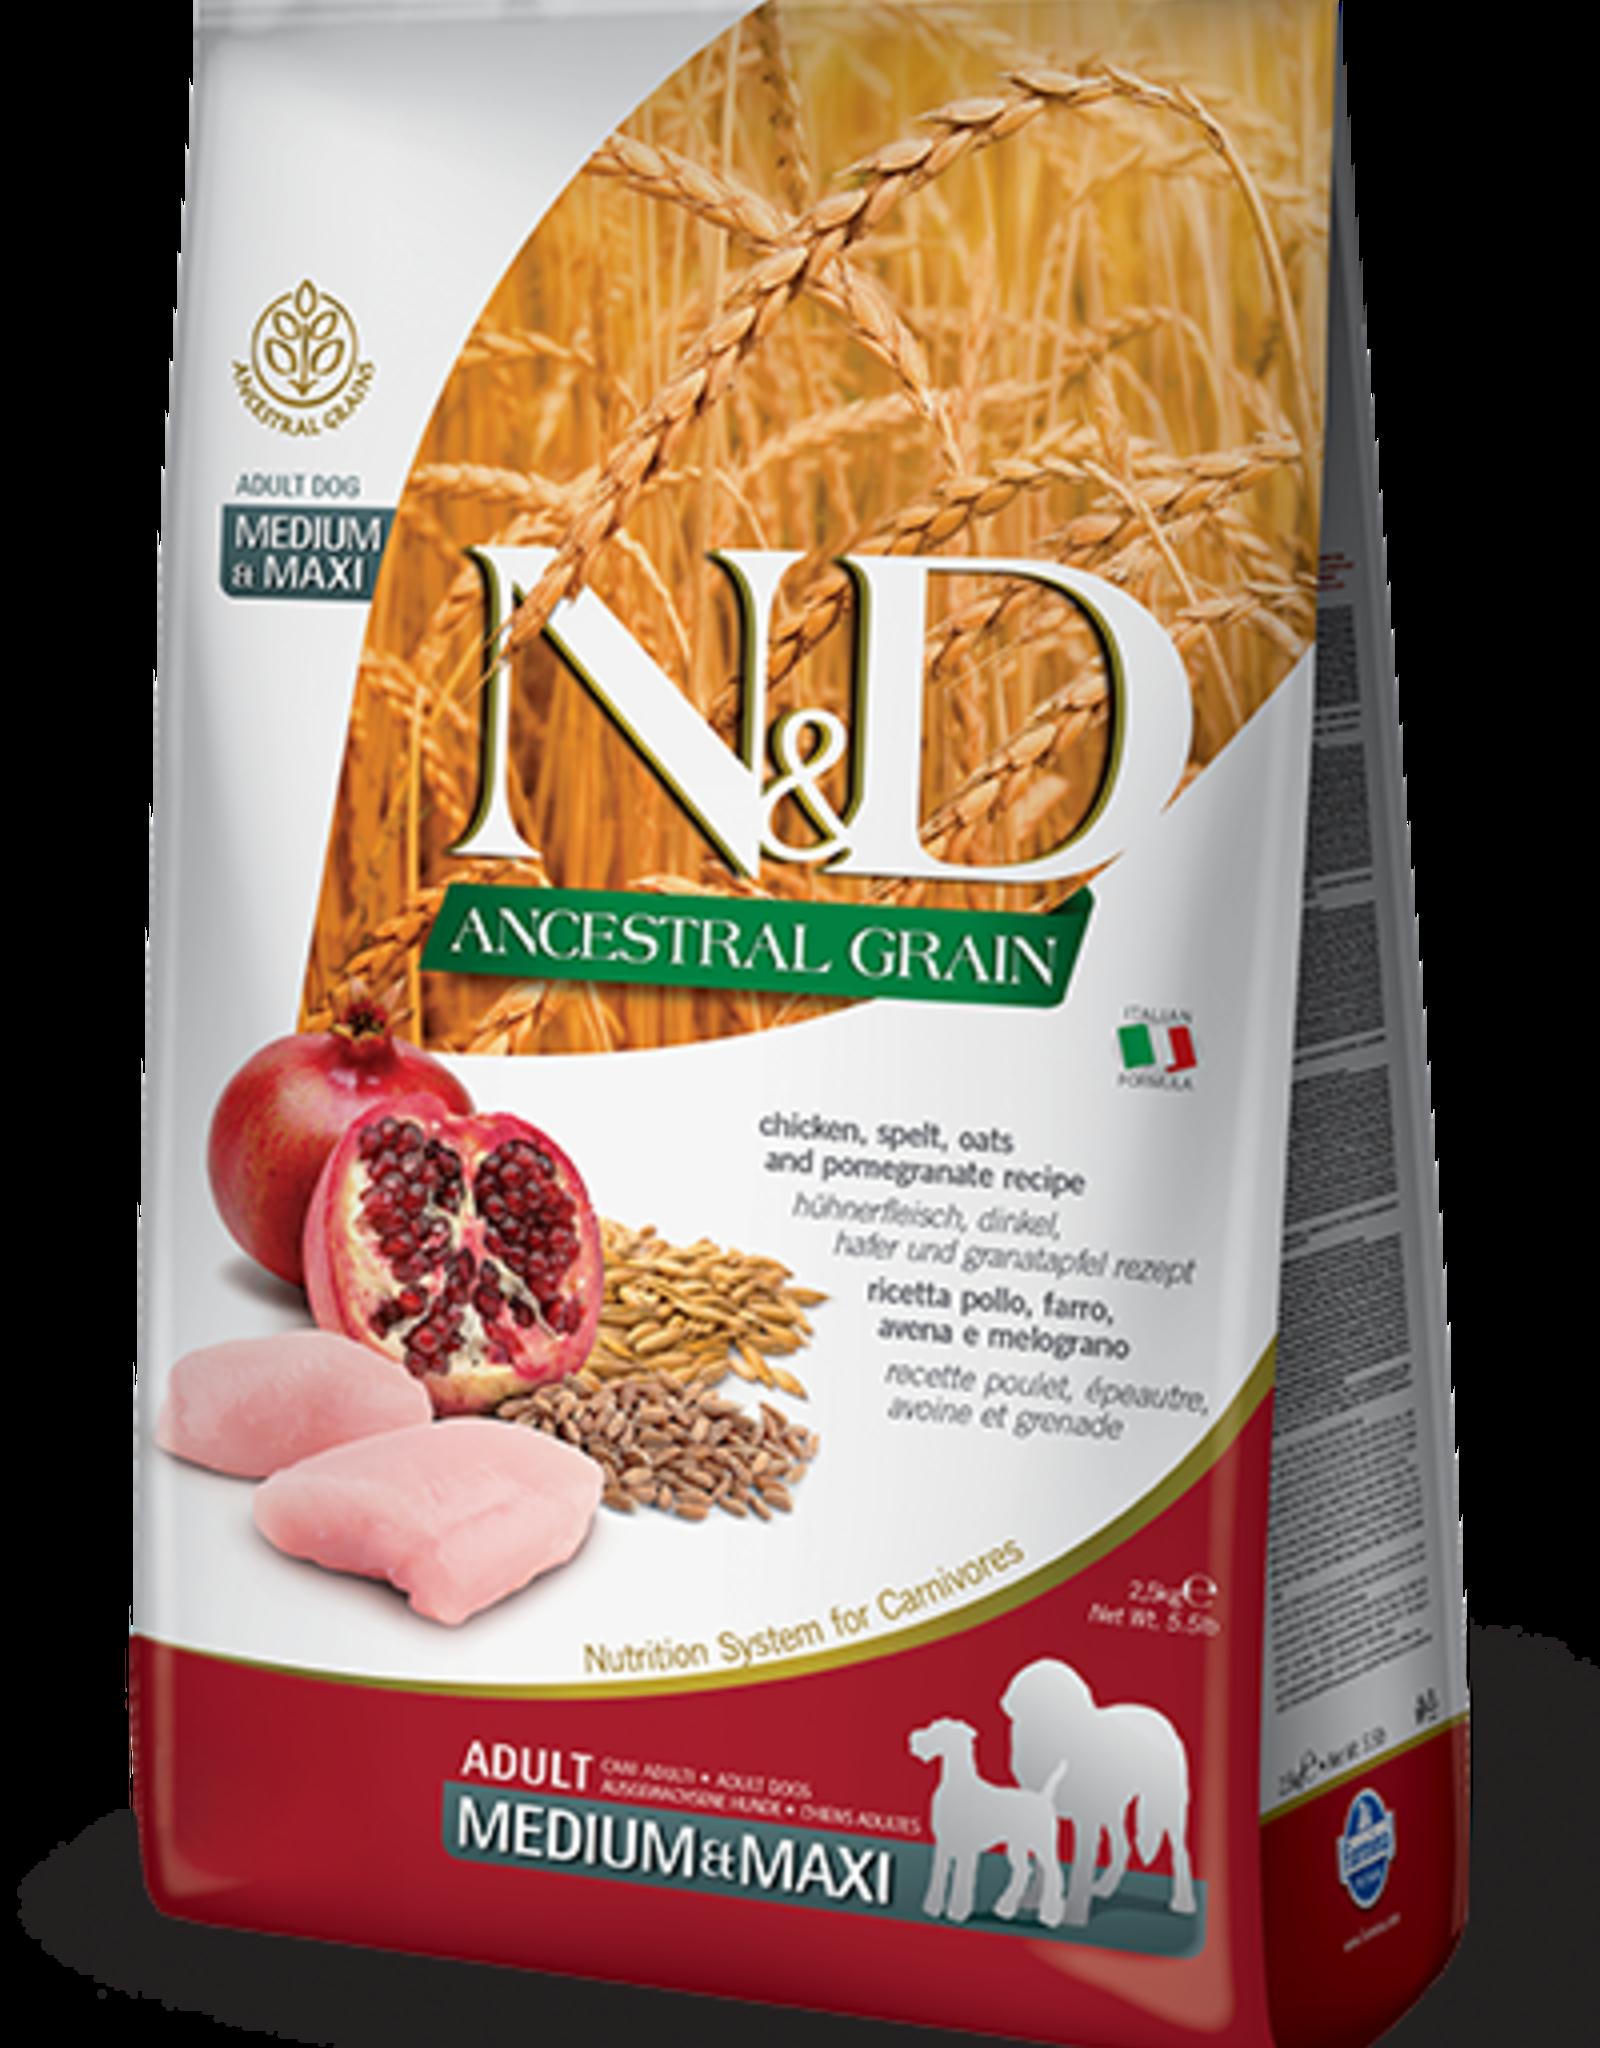 Farmina Farmina Ancestral Grain | Chicken & Pomegranate Adult MEDIUM AND MAXI 26.4 lb